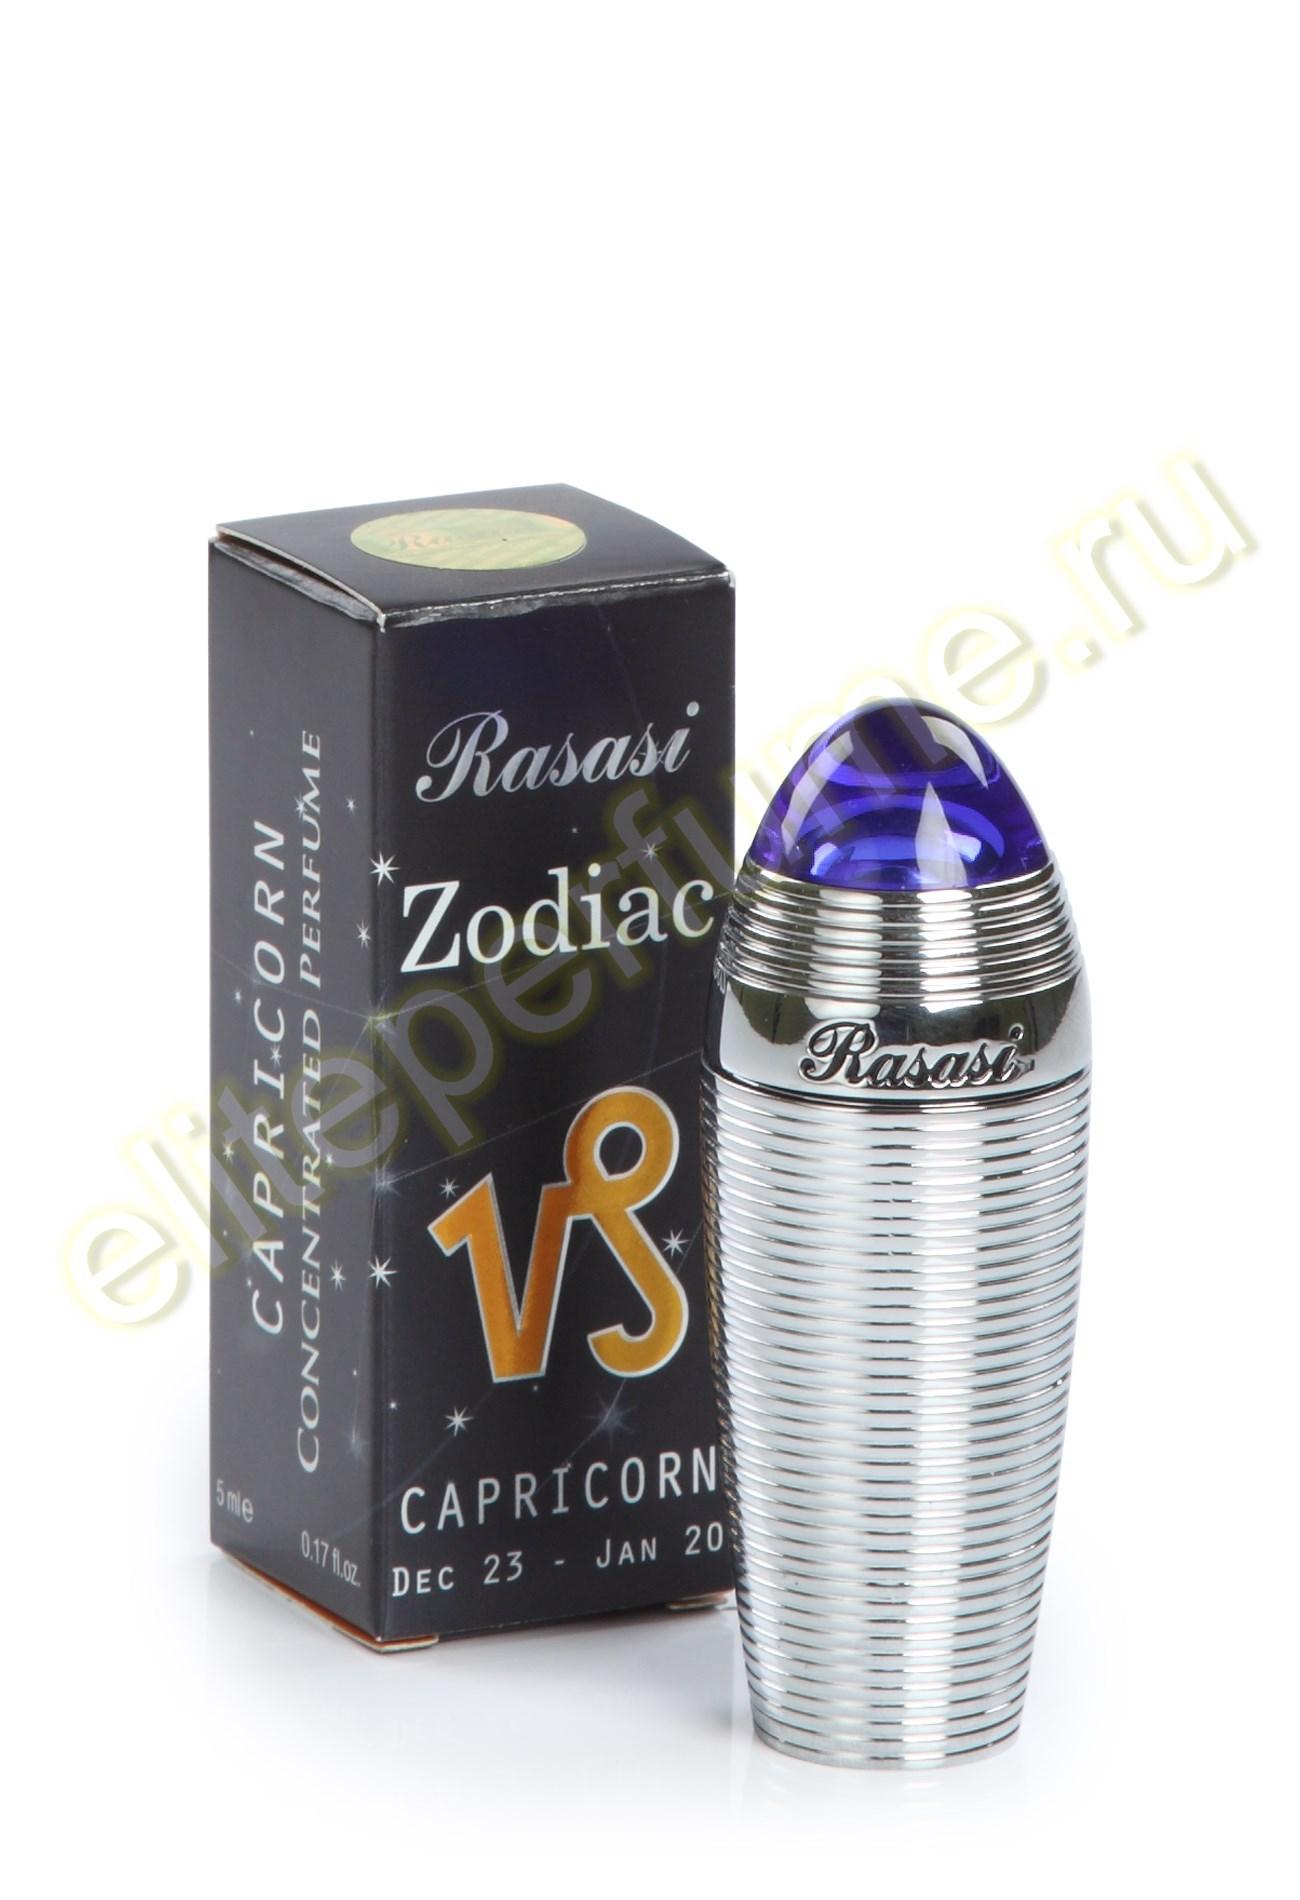 Зодиак Козерог Zodiac Capricorn 5 мл арабские масляные духи от Расаси Rasasi Perfumes